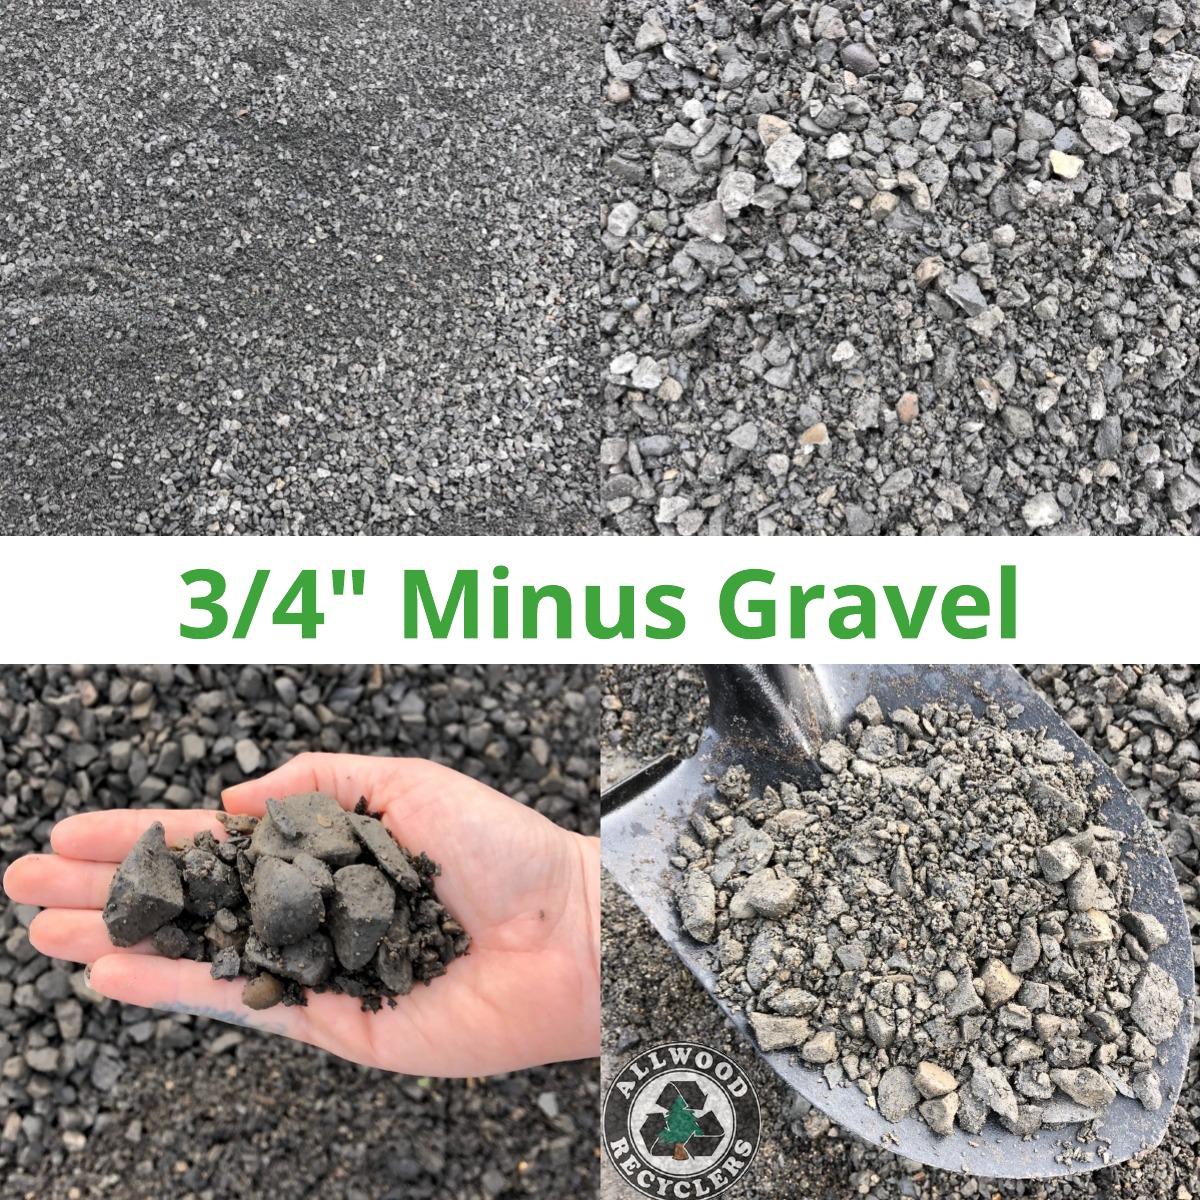 3/4 Minus Gravel